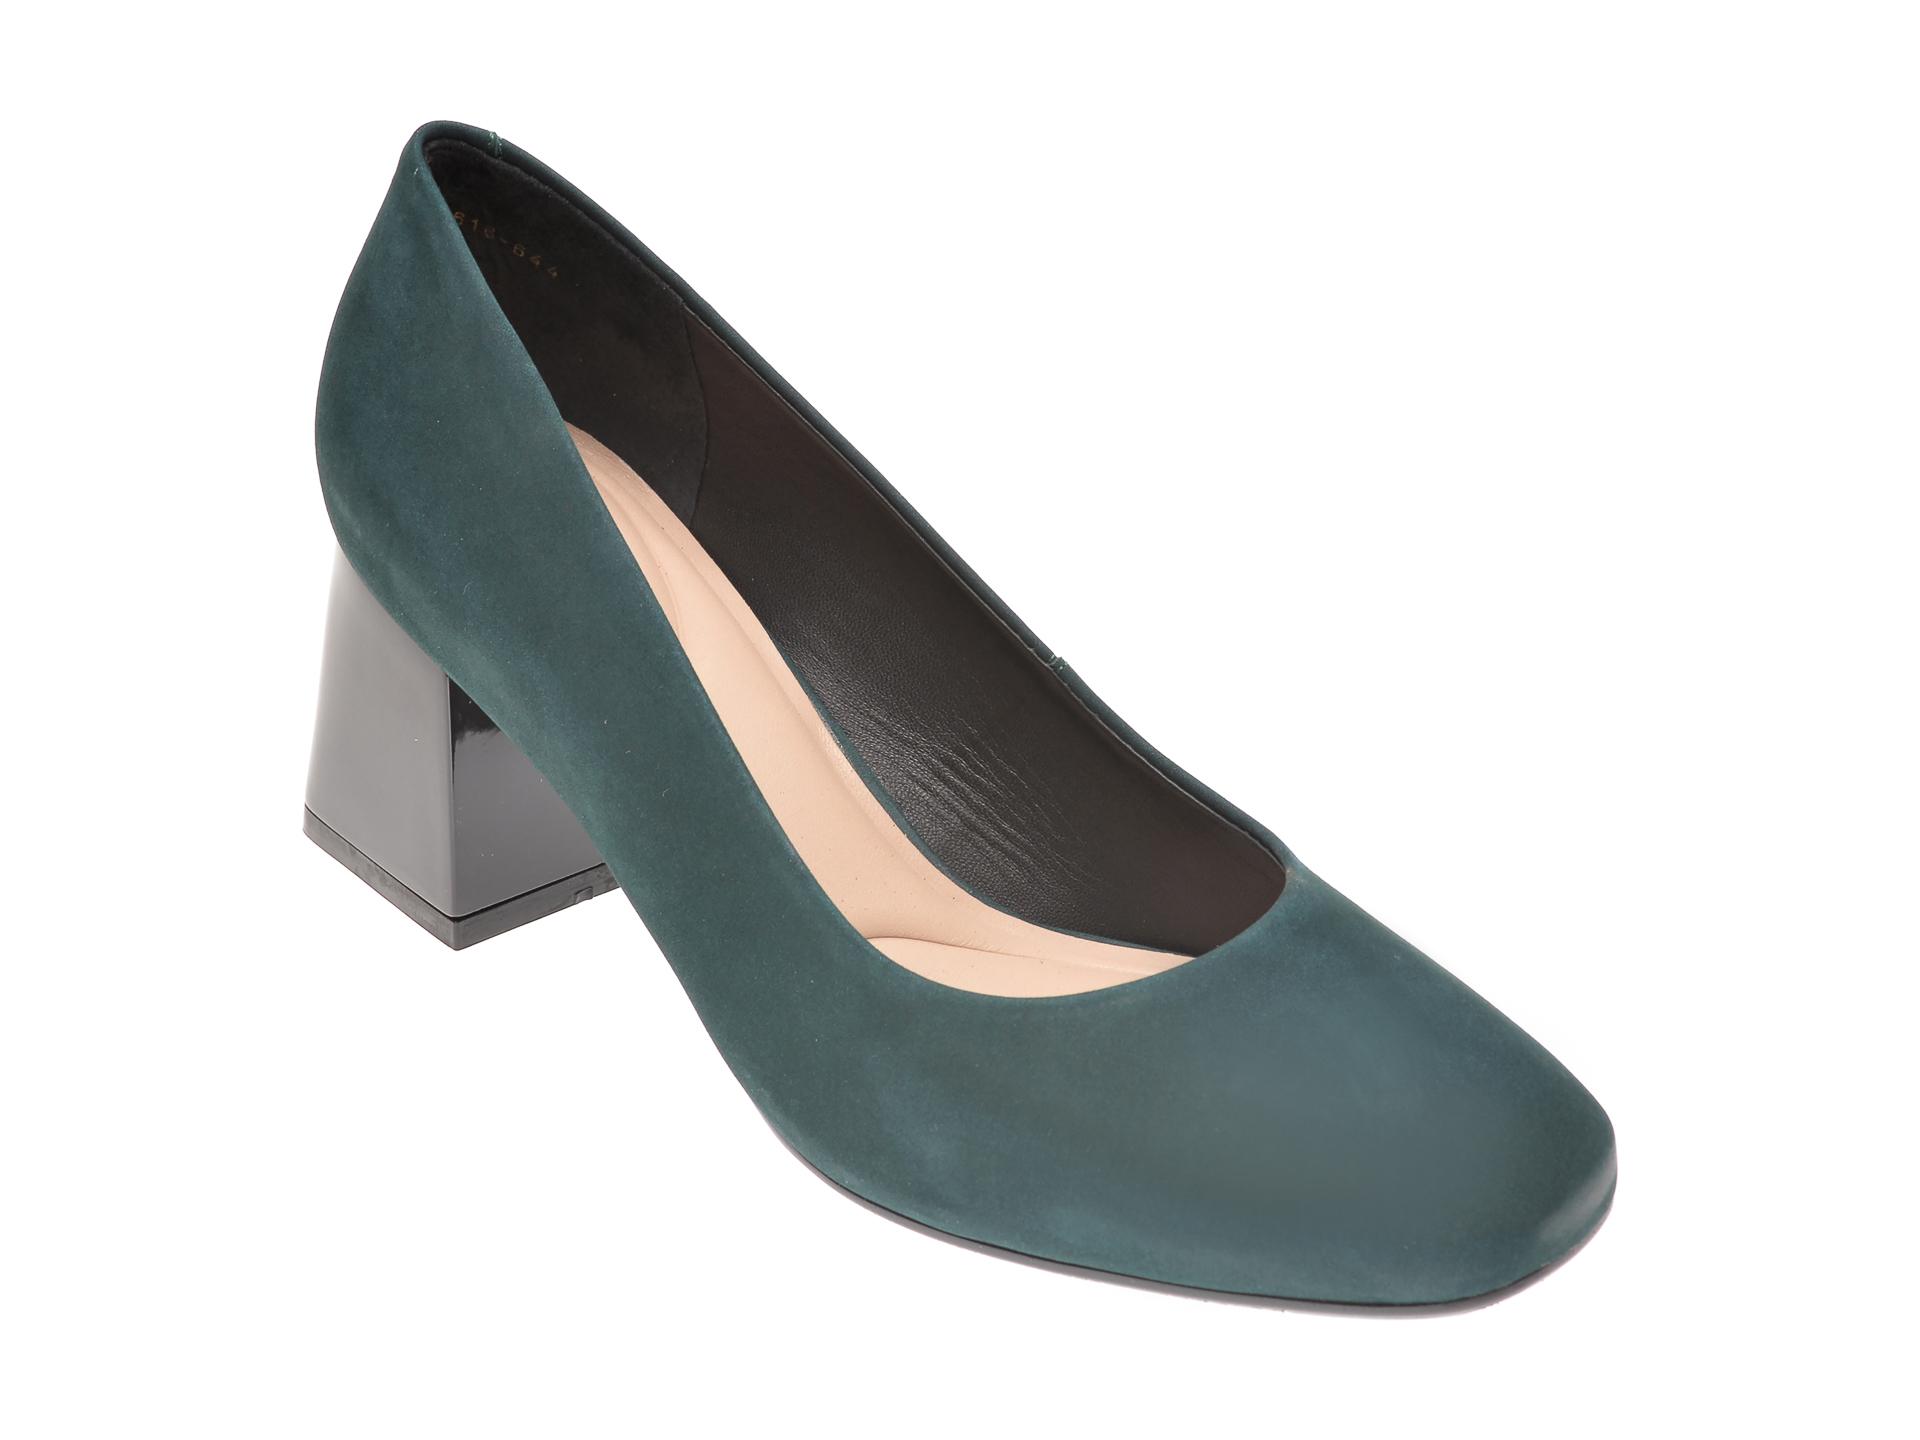 Pantofi EPICA verzi, 2129616, din nabuc